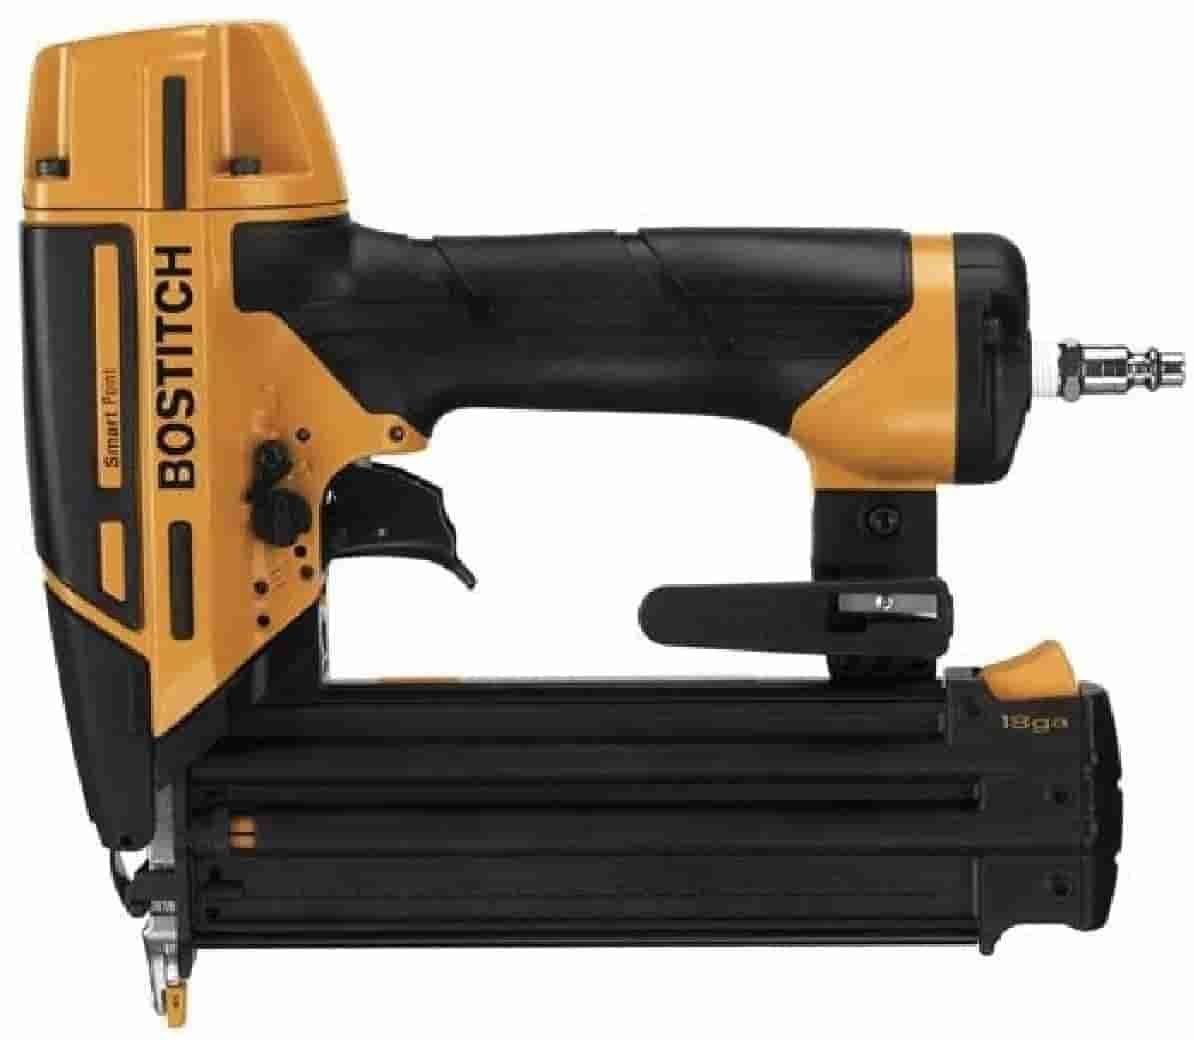 BOSTITCH Nail Gun (BTFP12233)